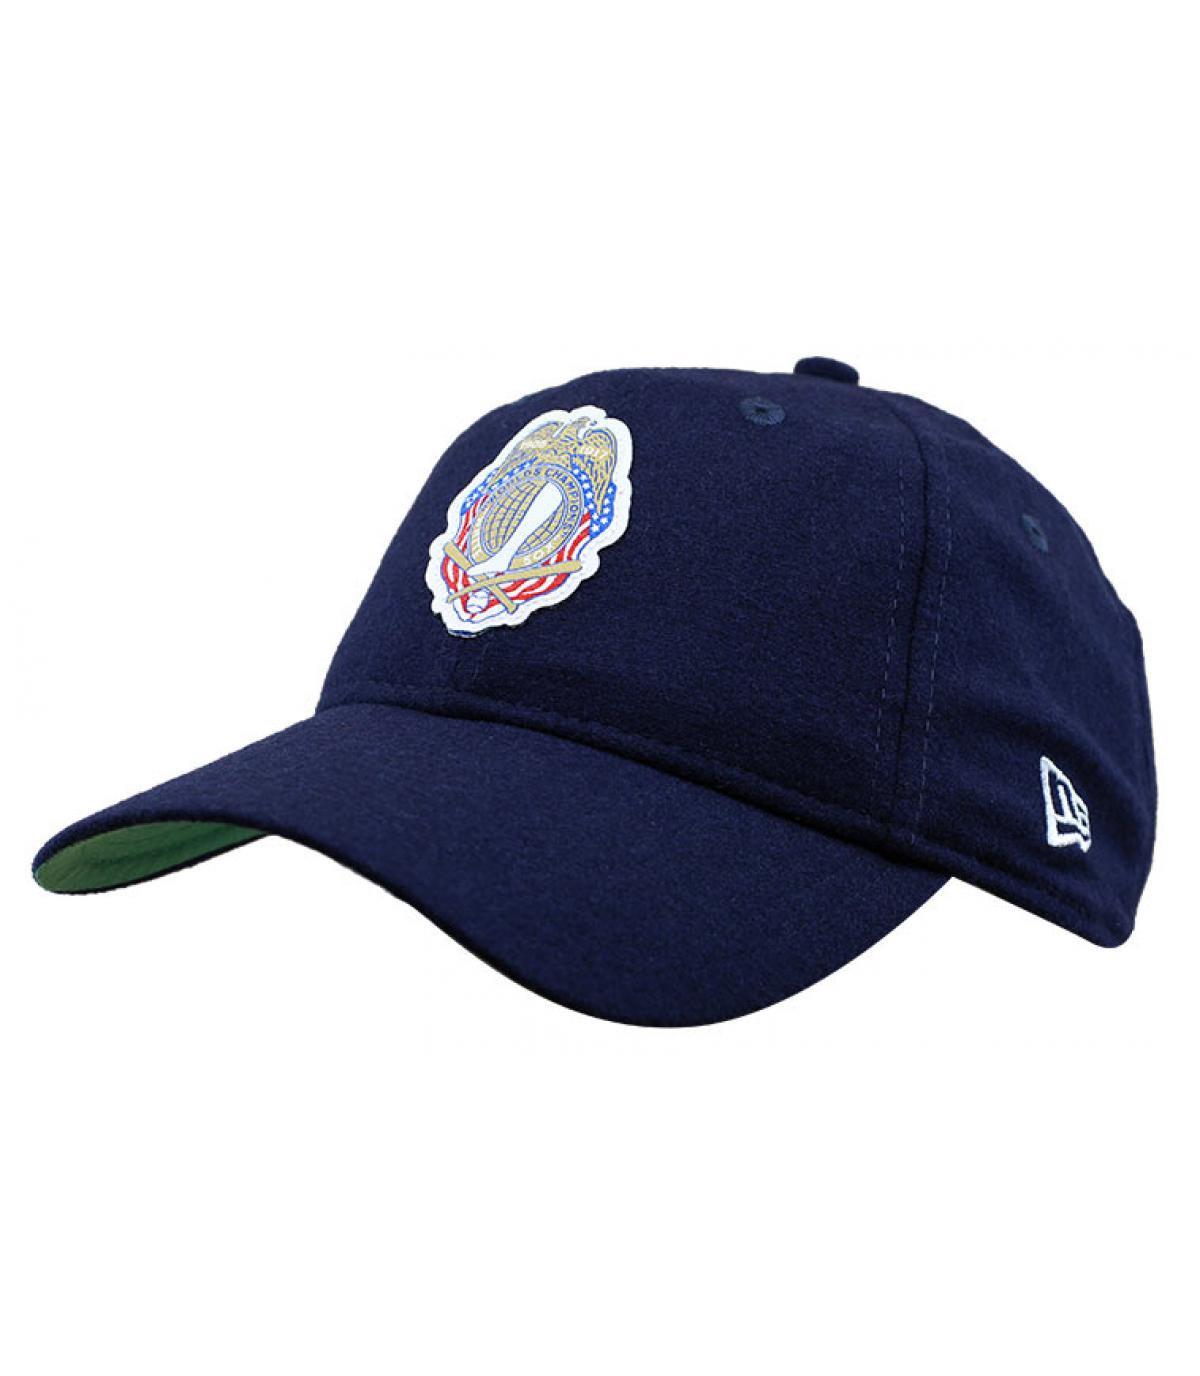 casquette Sox bleu